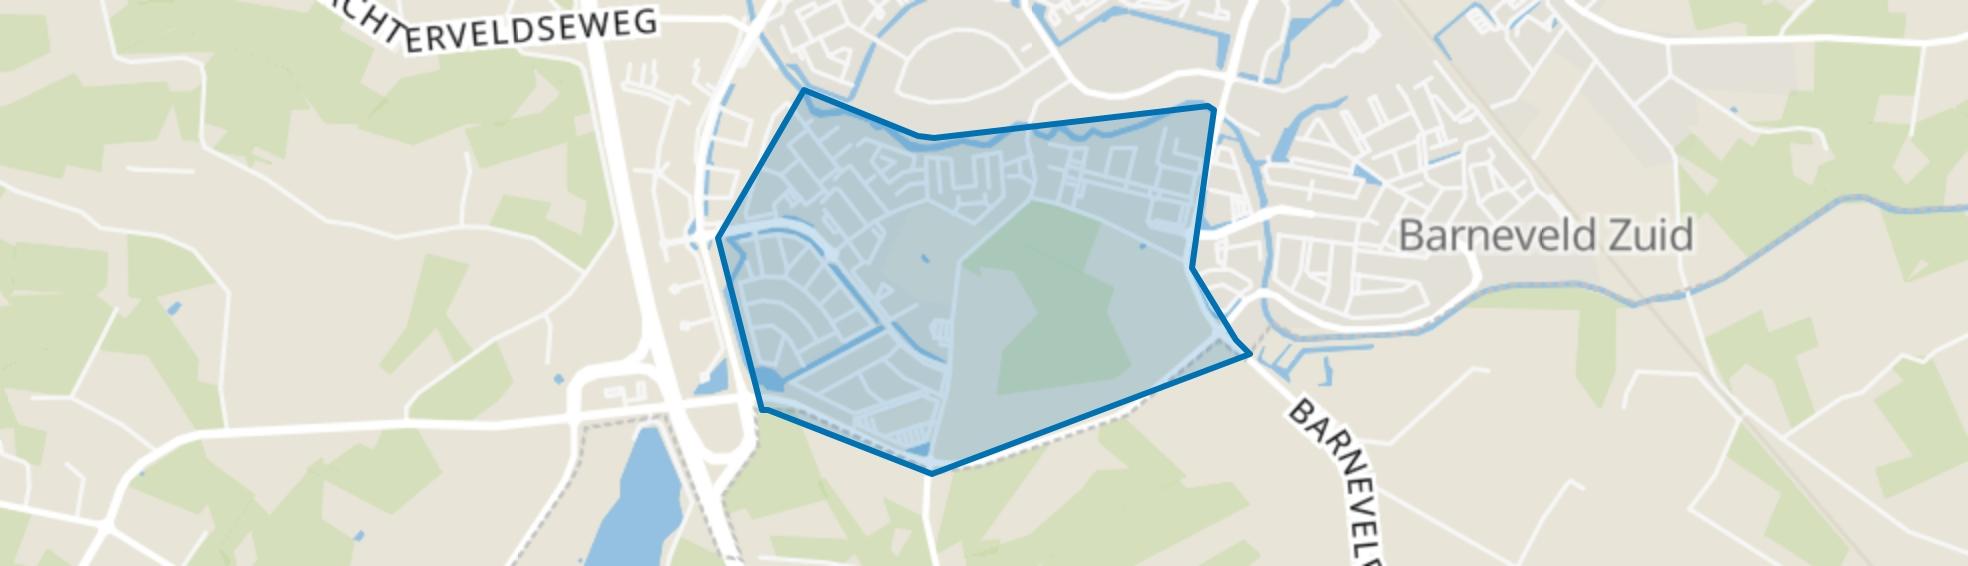 De Burgt, Barneveld map